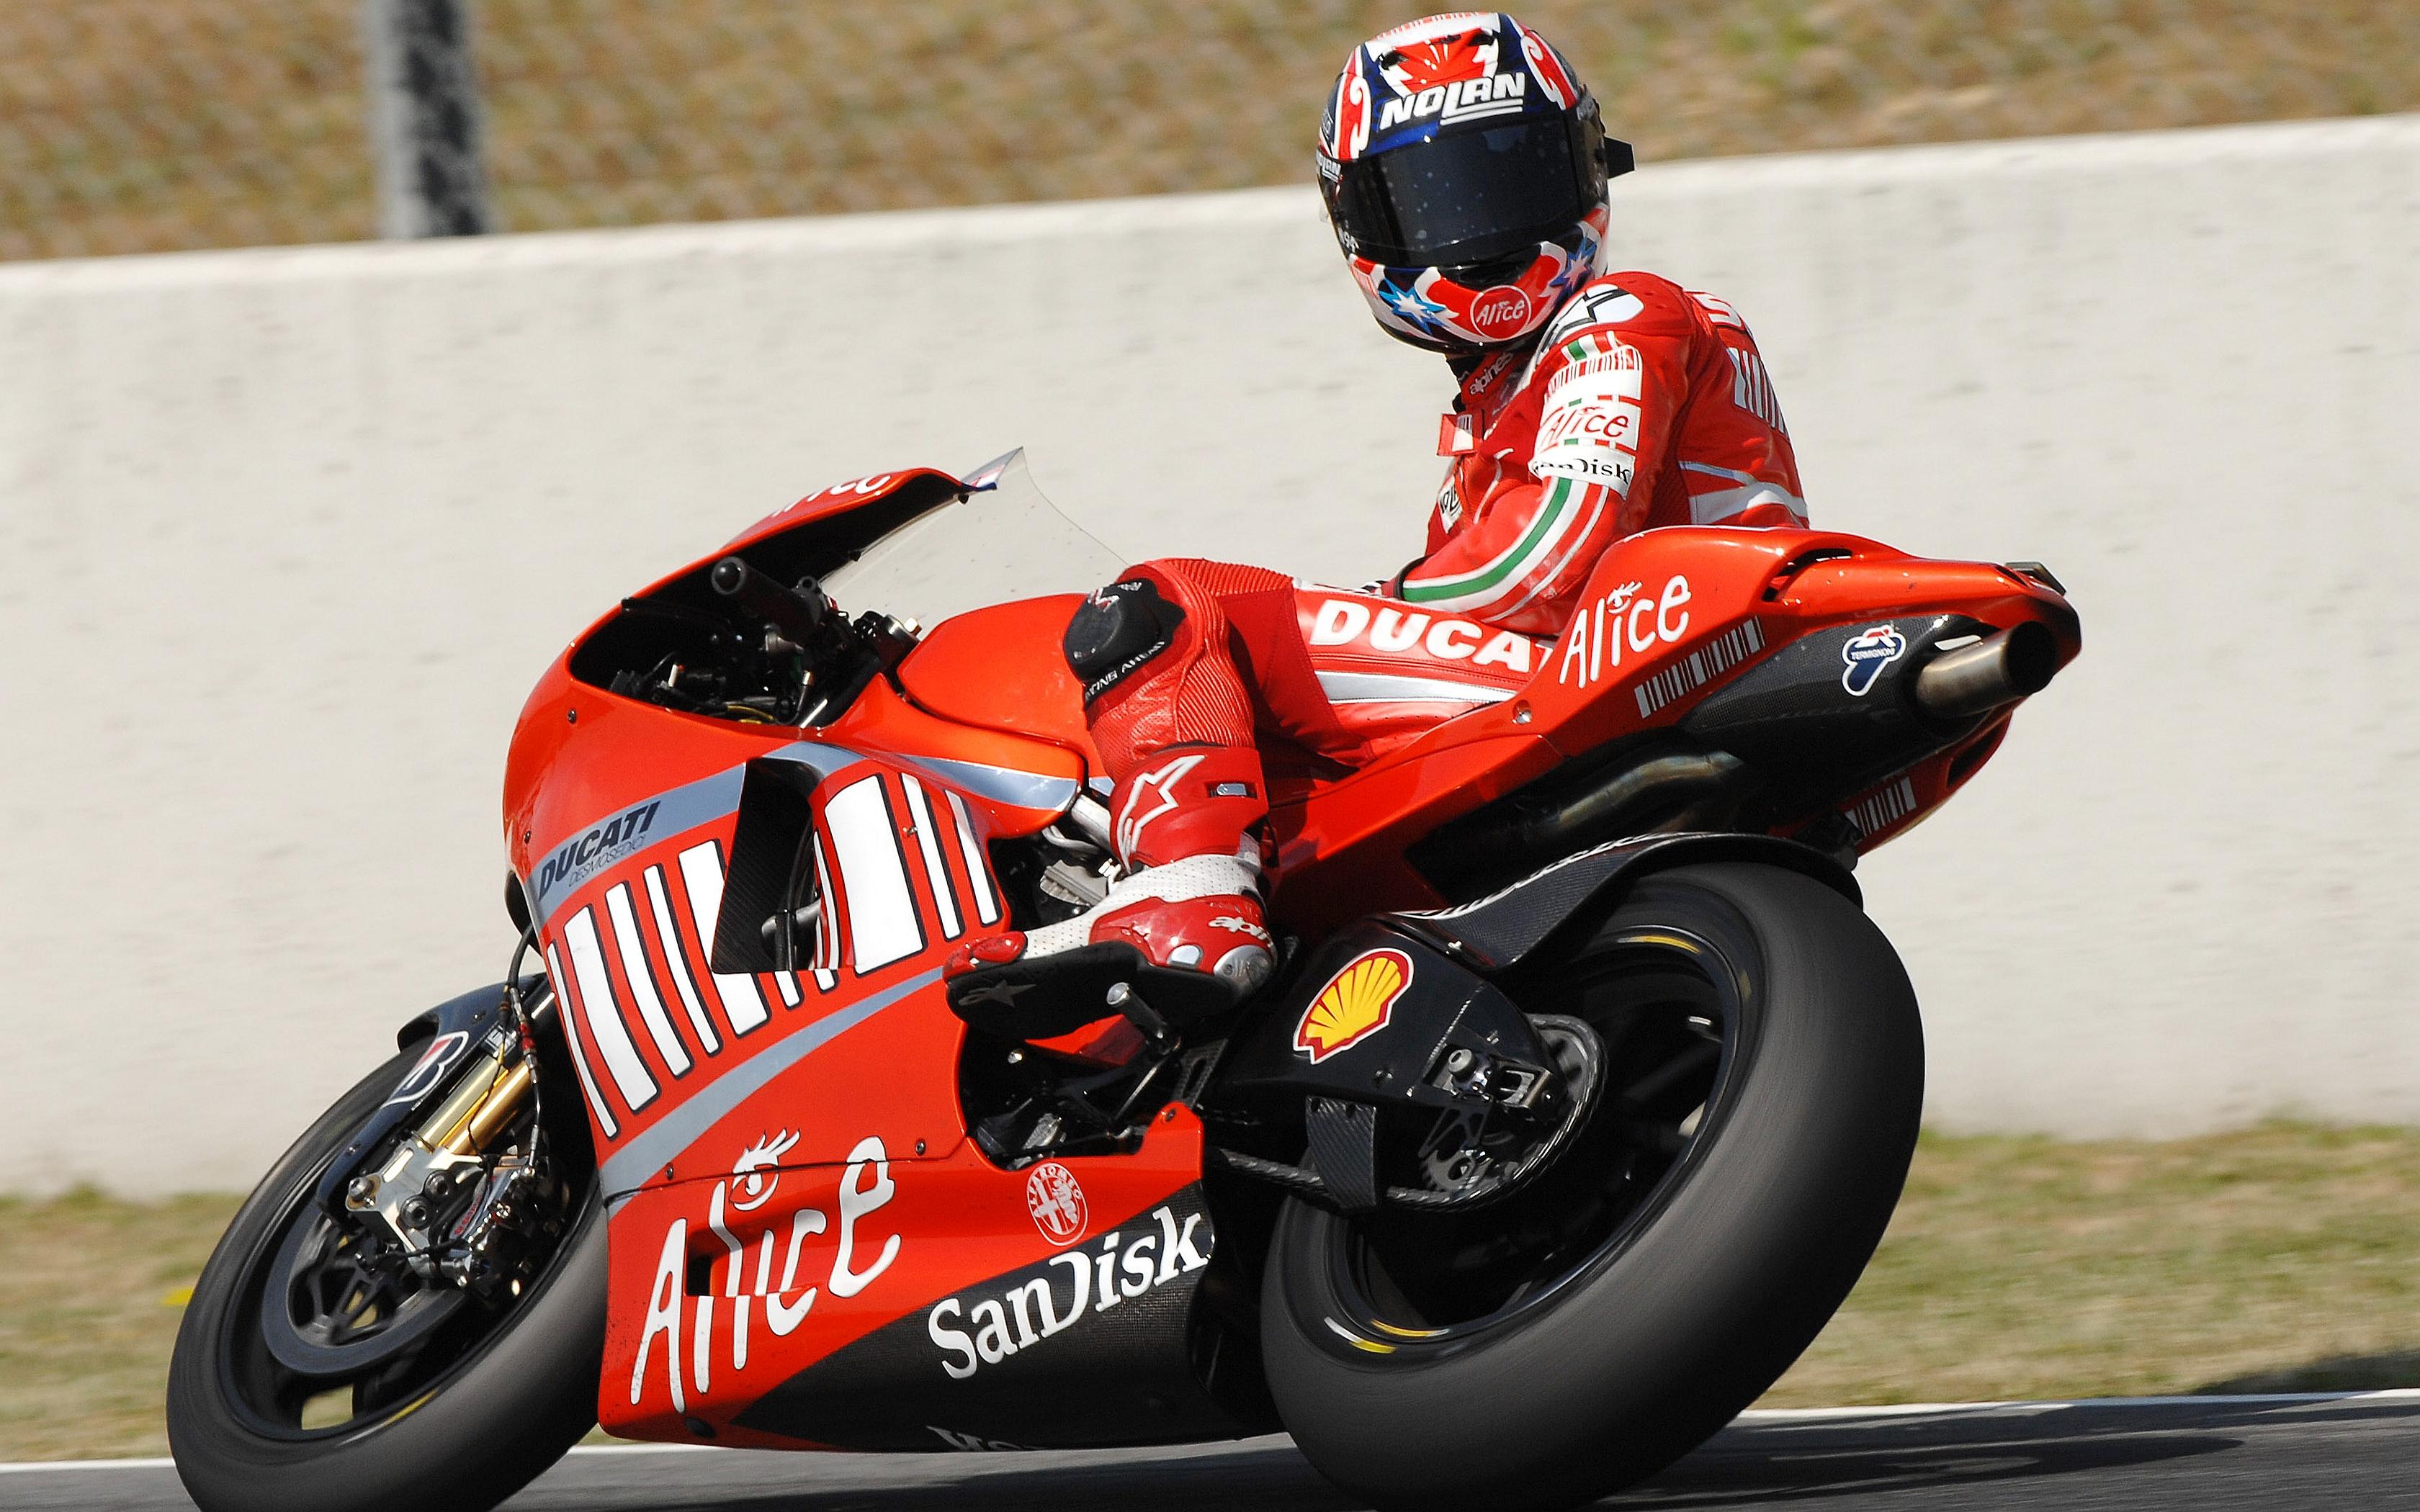 Red Ducati Bike Widescreen Wallpaper 60233 3360x2100 Px